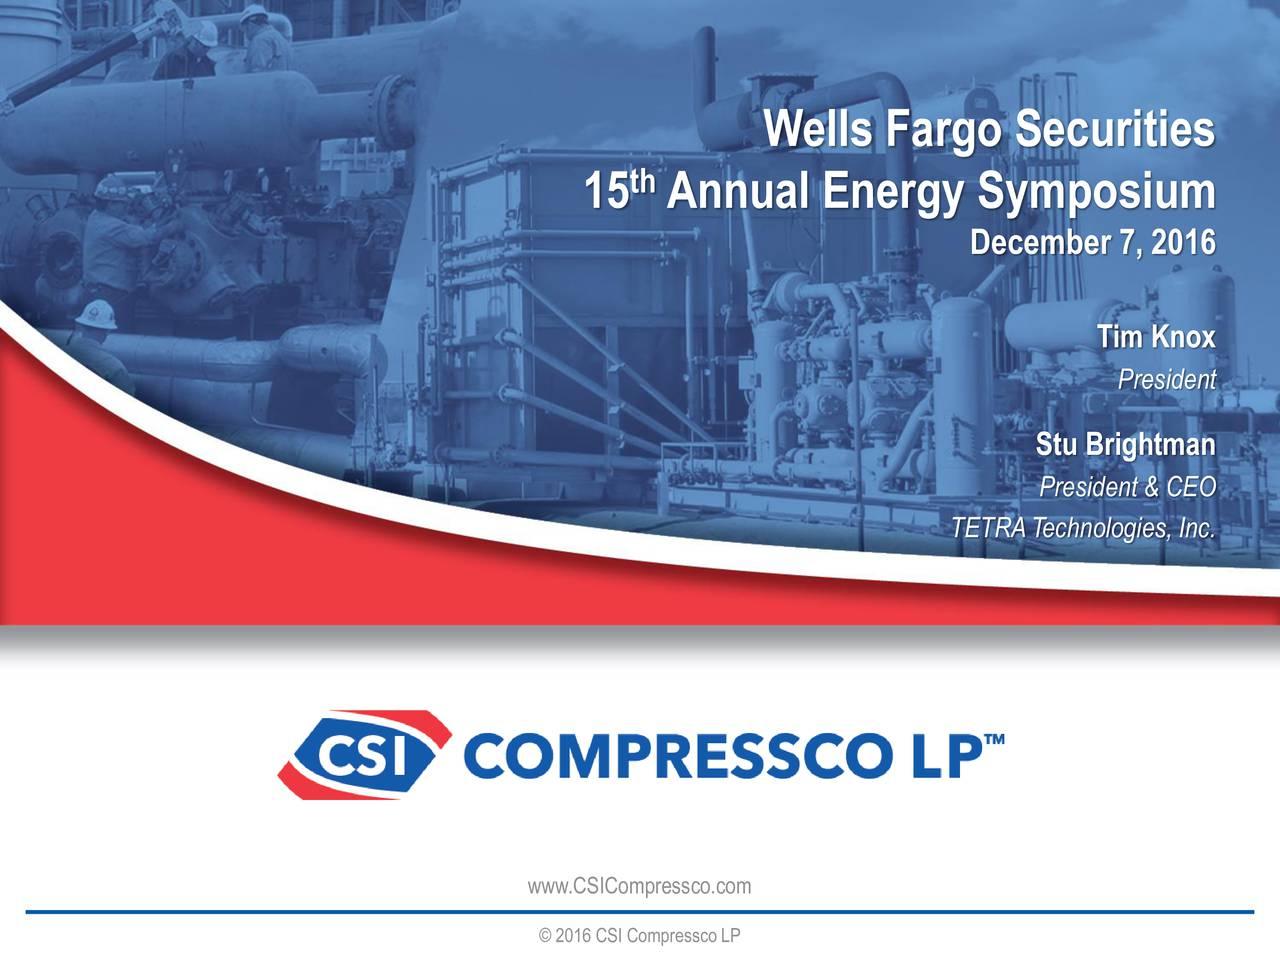 15 Annual Energy Symposium December 7, 2016 Tim Knox President Stu Brightman President & CEO TETRATechnologies, Inc. www.CSICompressco.com 2016 CSI CompresscoLP